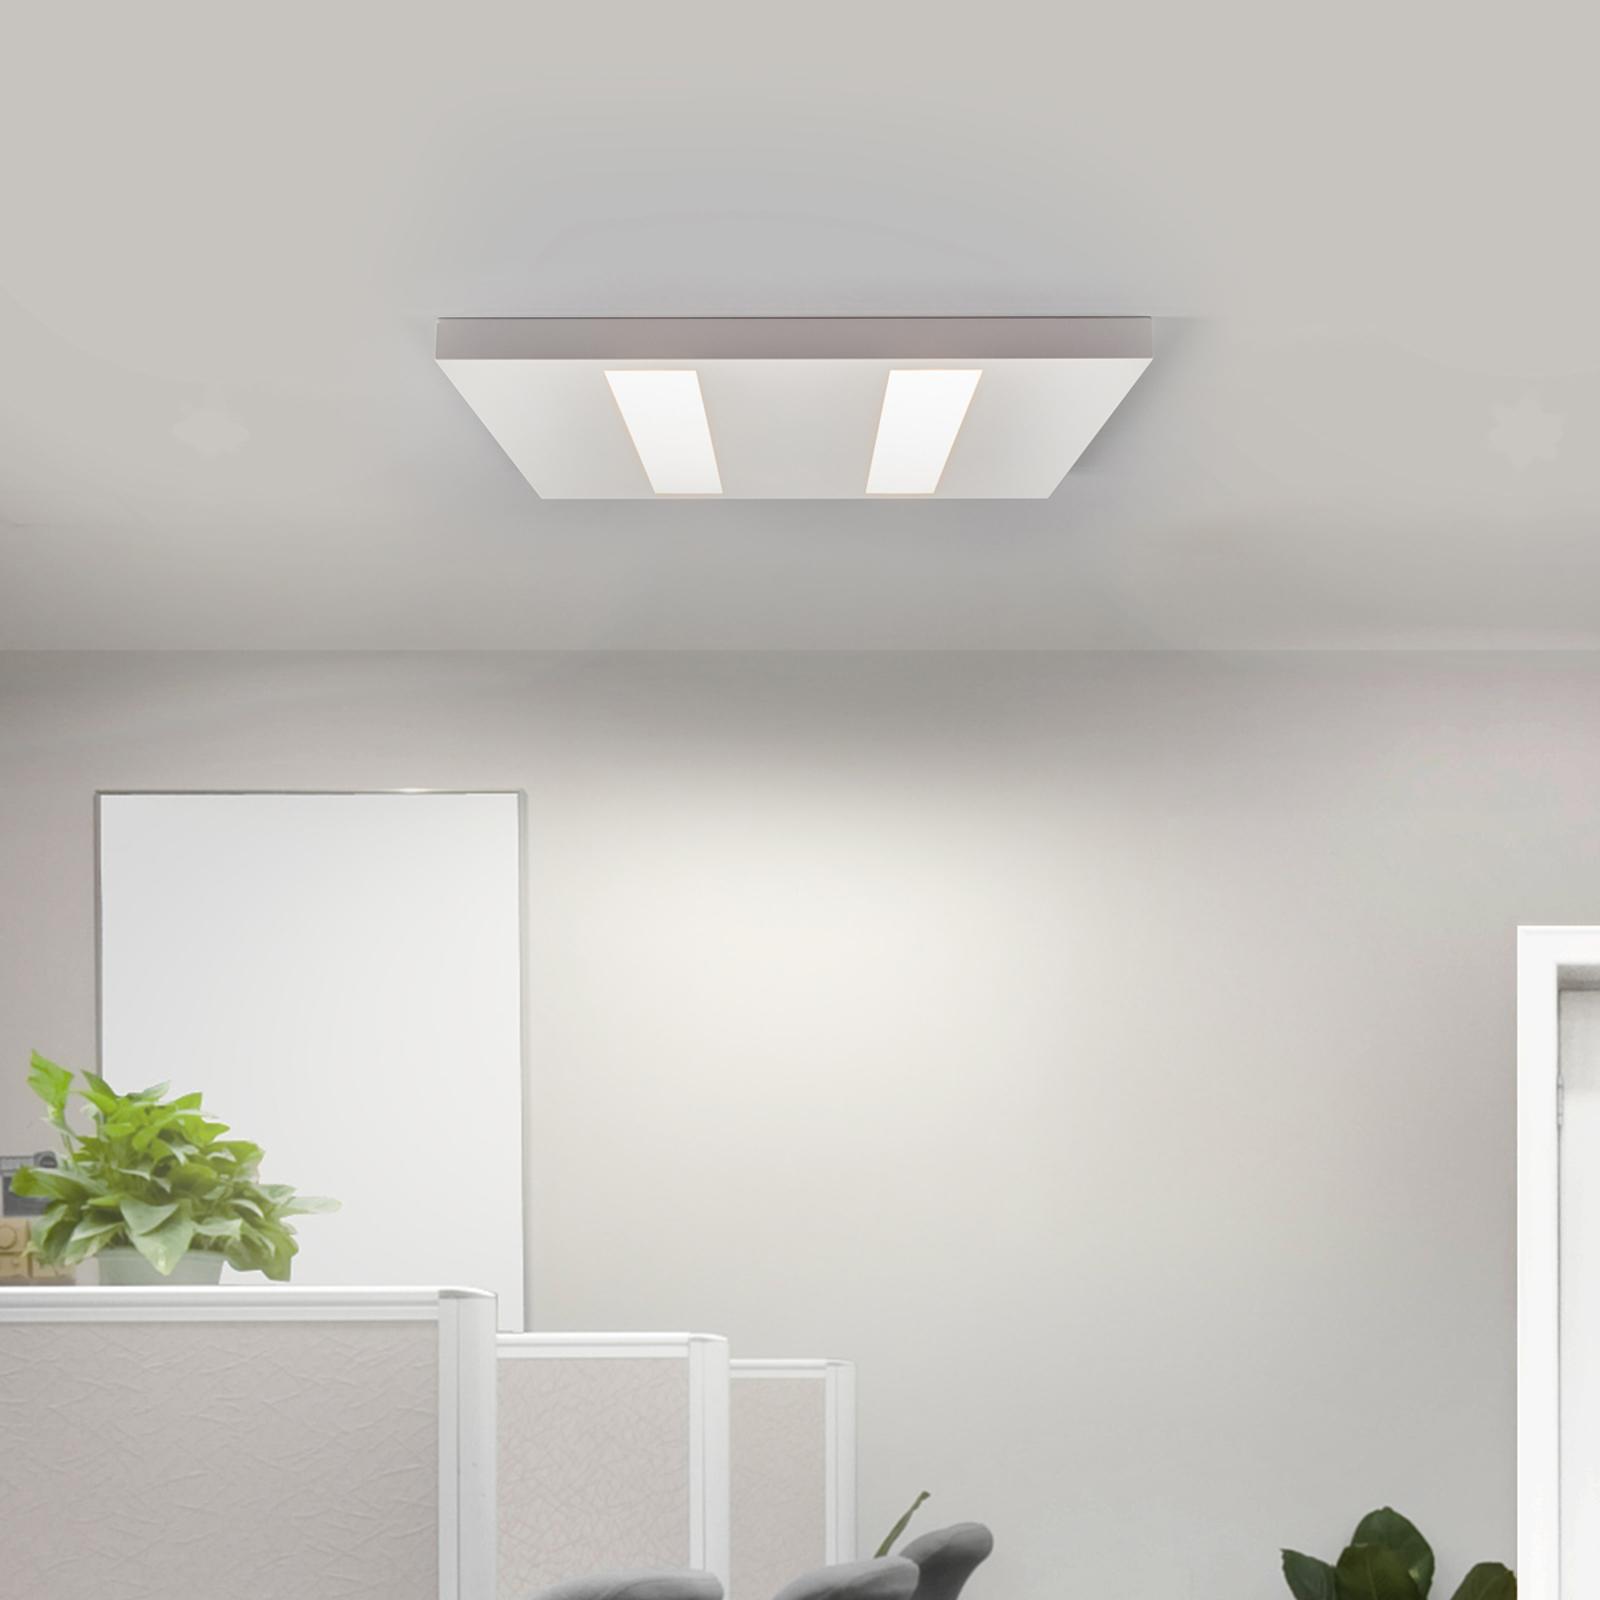 Dunne LED opbouwlamp 37 W wit, OSRAM-LED's